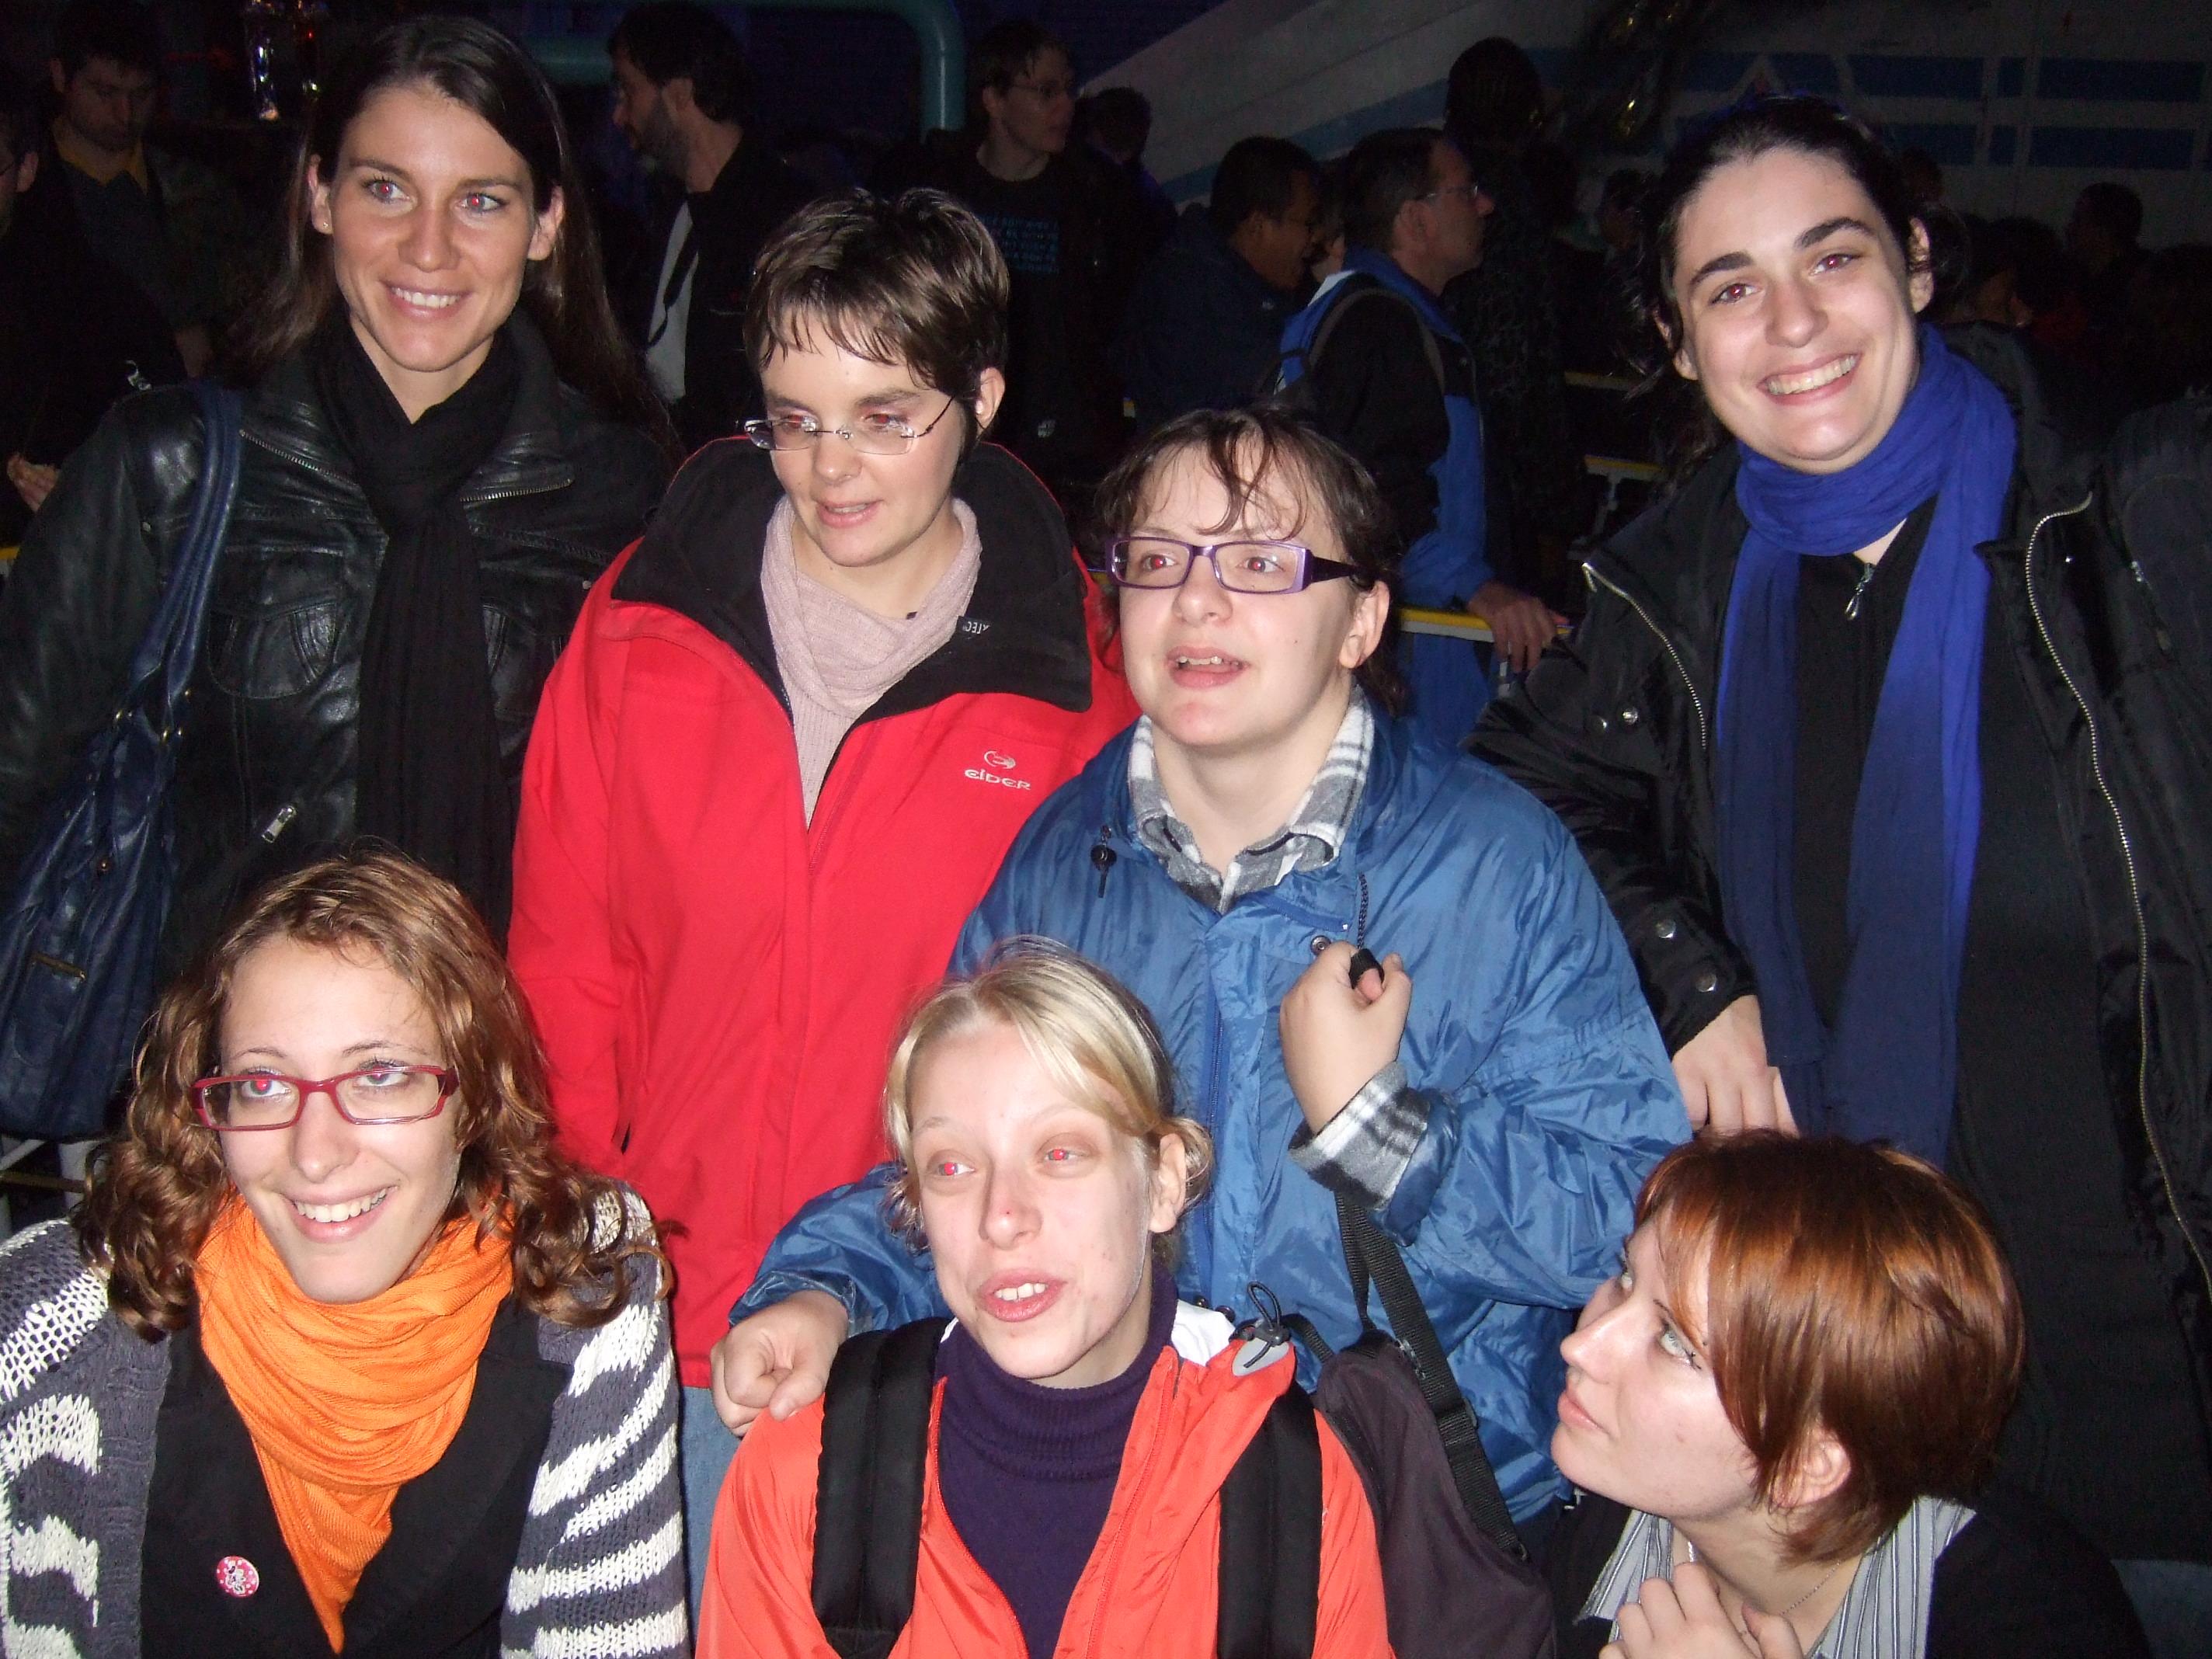 Photo 17 - geekette, Mara_Jade, AngeSolo, Camie, maggy, Padmeia, Kenda